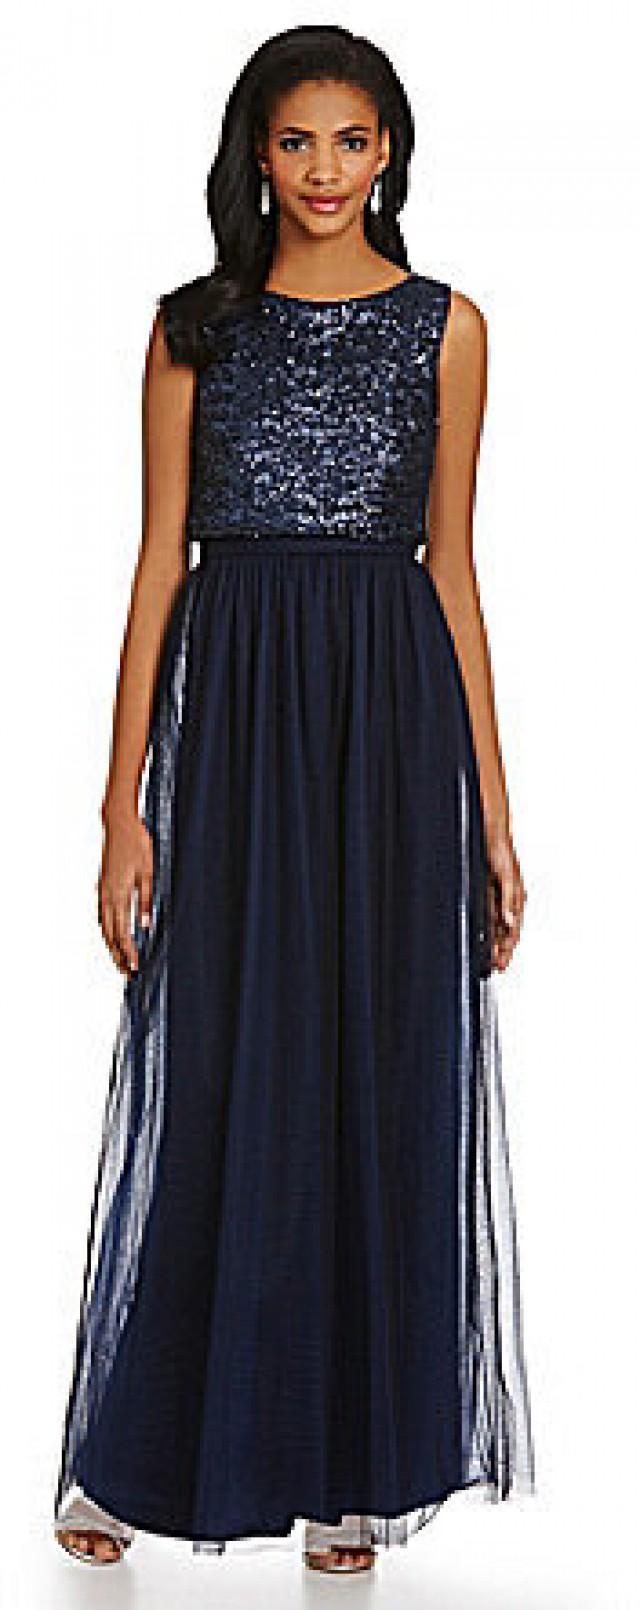 vera wang sequined popover bodice skirt dress 2249607 weddbook. Black Bedroom Furniture Sets. Home Design Ideas